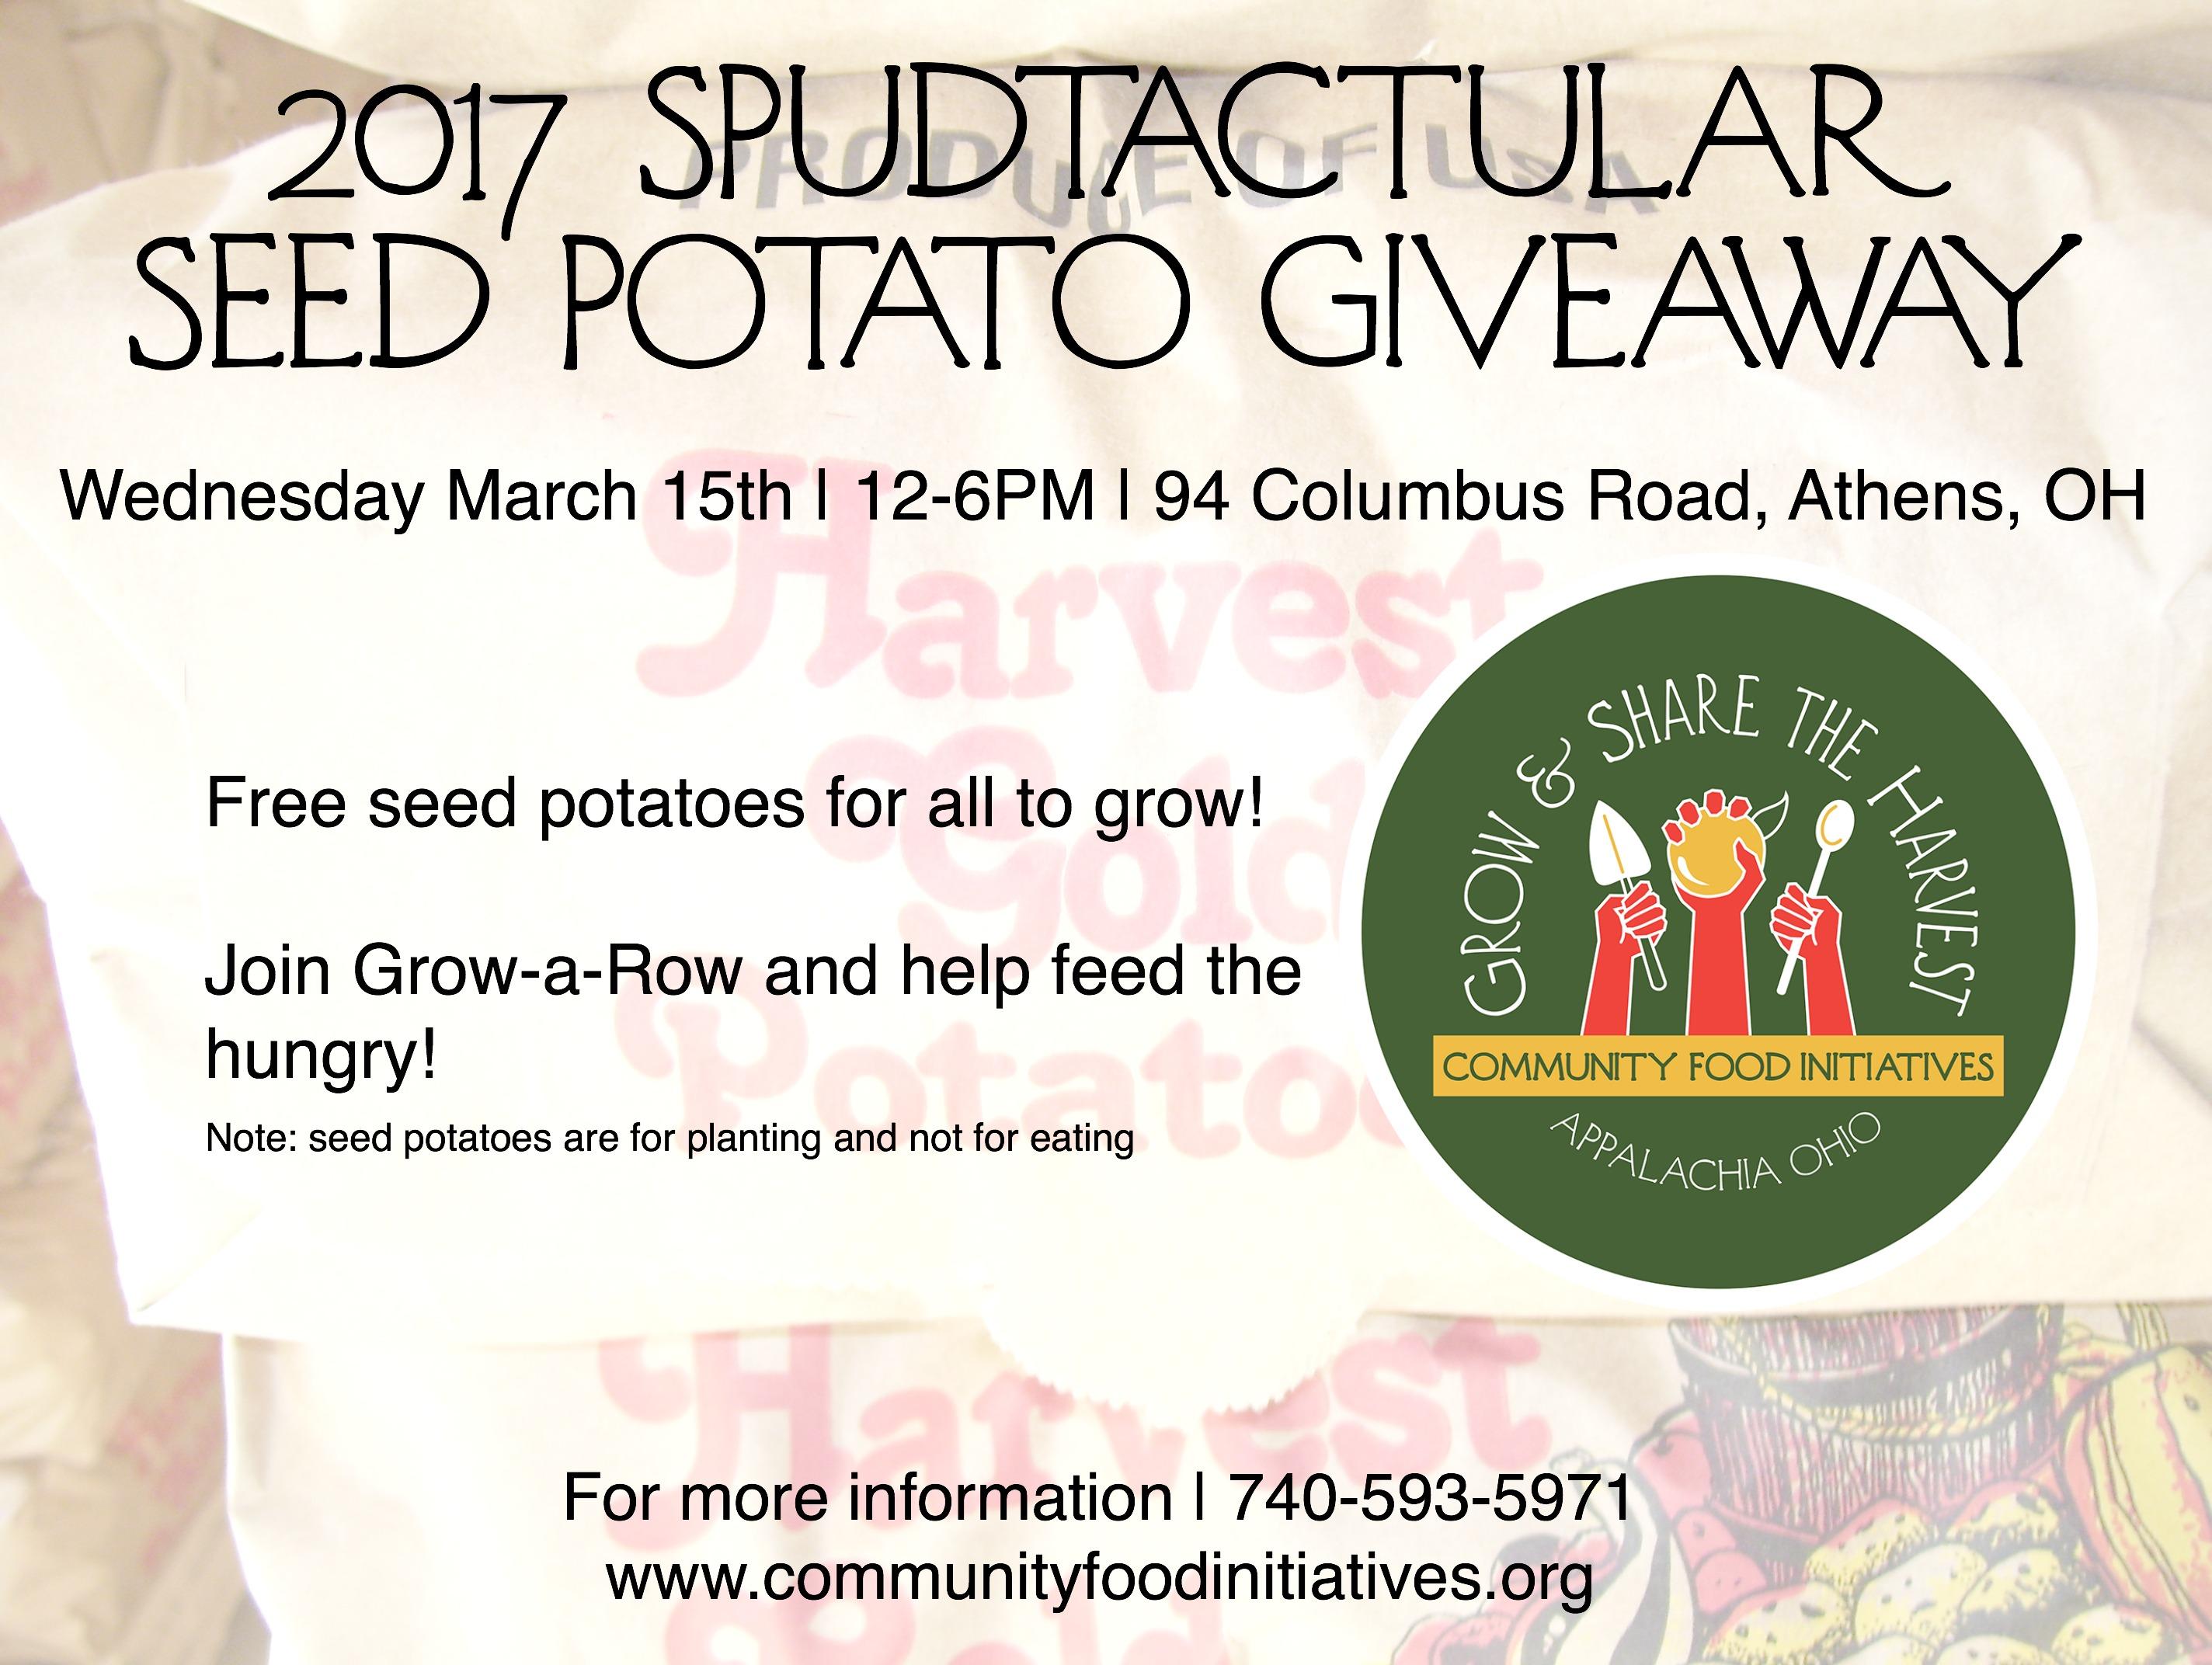 2017 Spudtactular Seed Potato Giveaway - WOUB Public Media